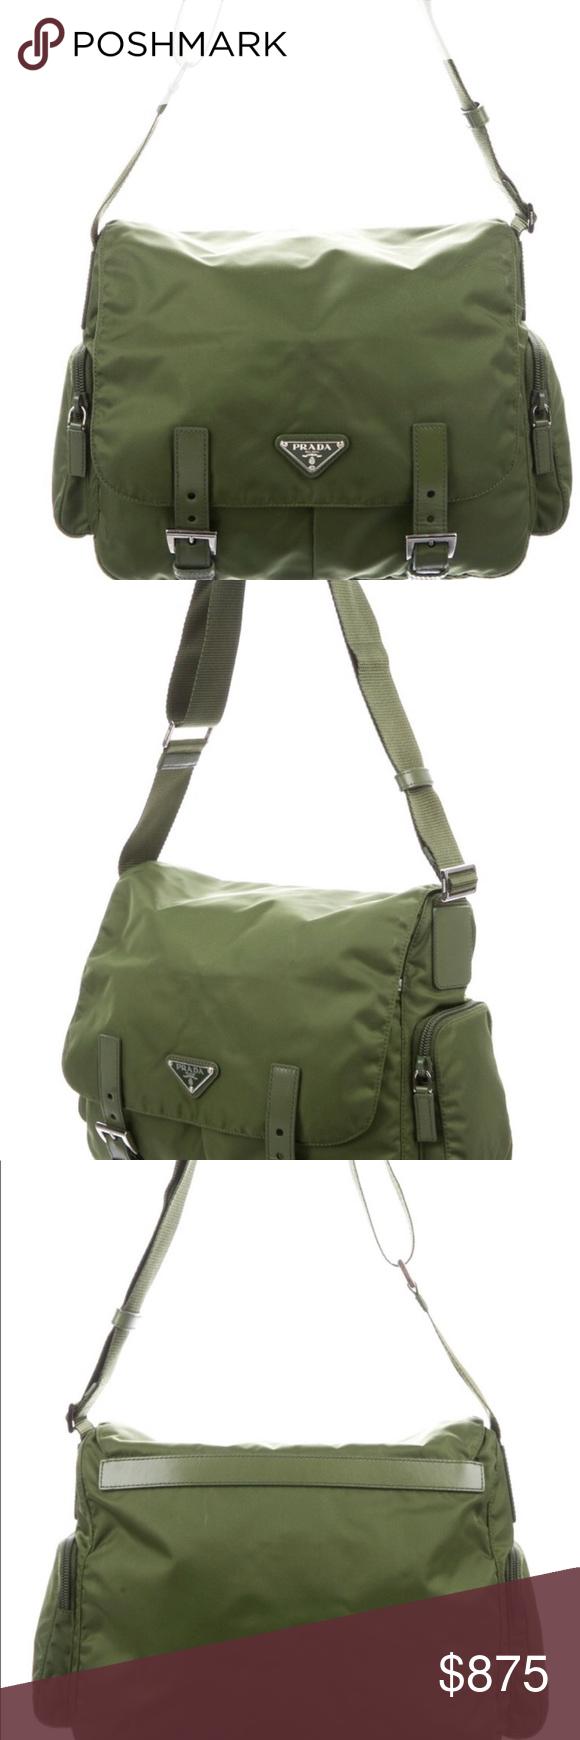 Photo of NWOT Authentic Prada messenger bag in army green Prada nylon messenger bag with …